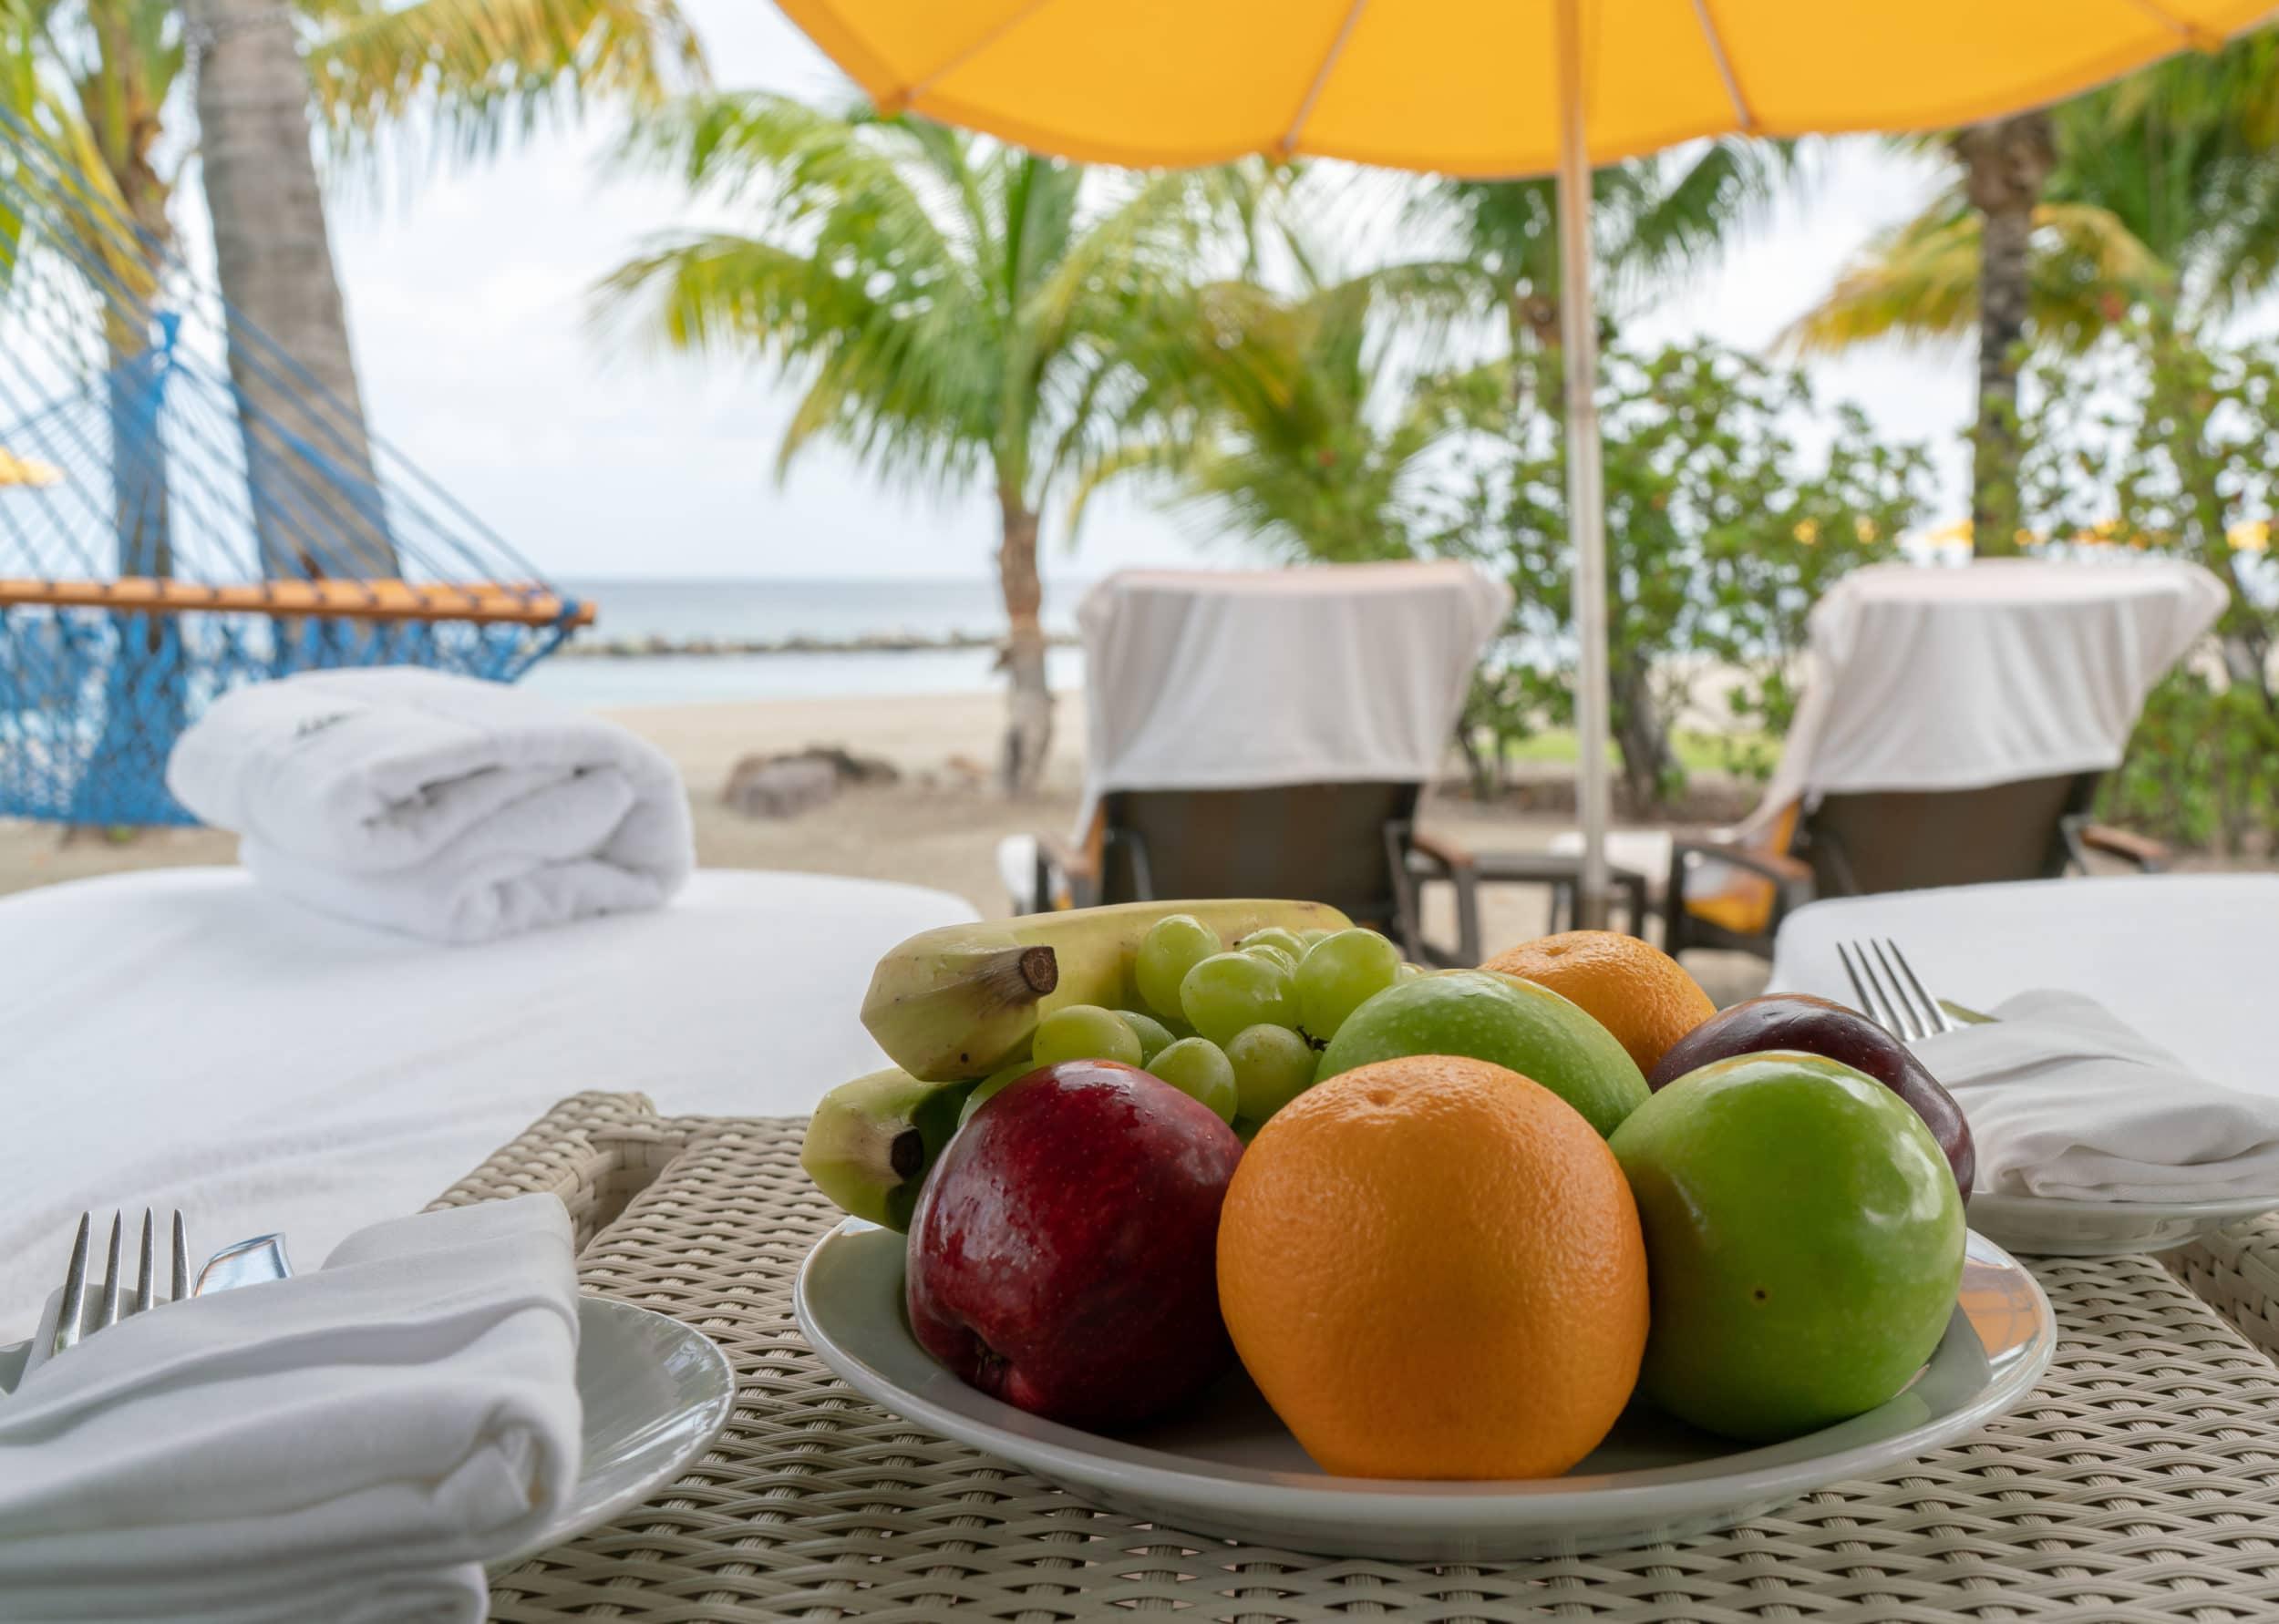 Fruit amenity at Four Seasons Nevis beach cabanas